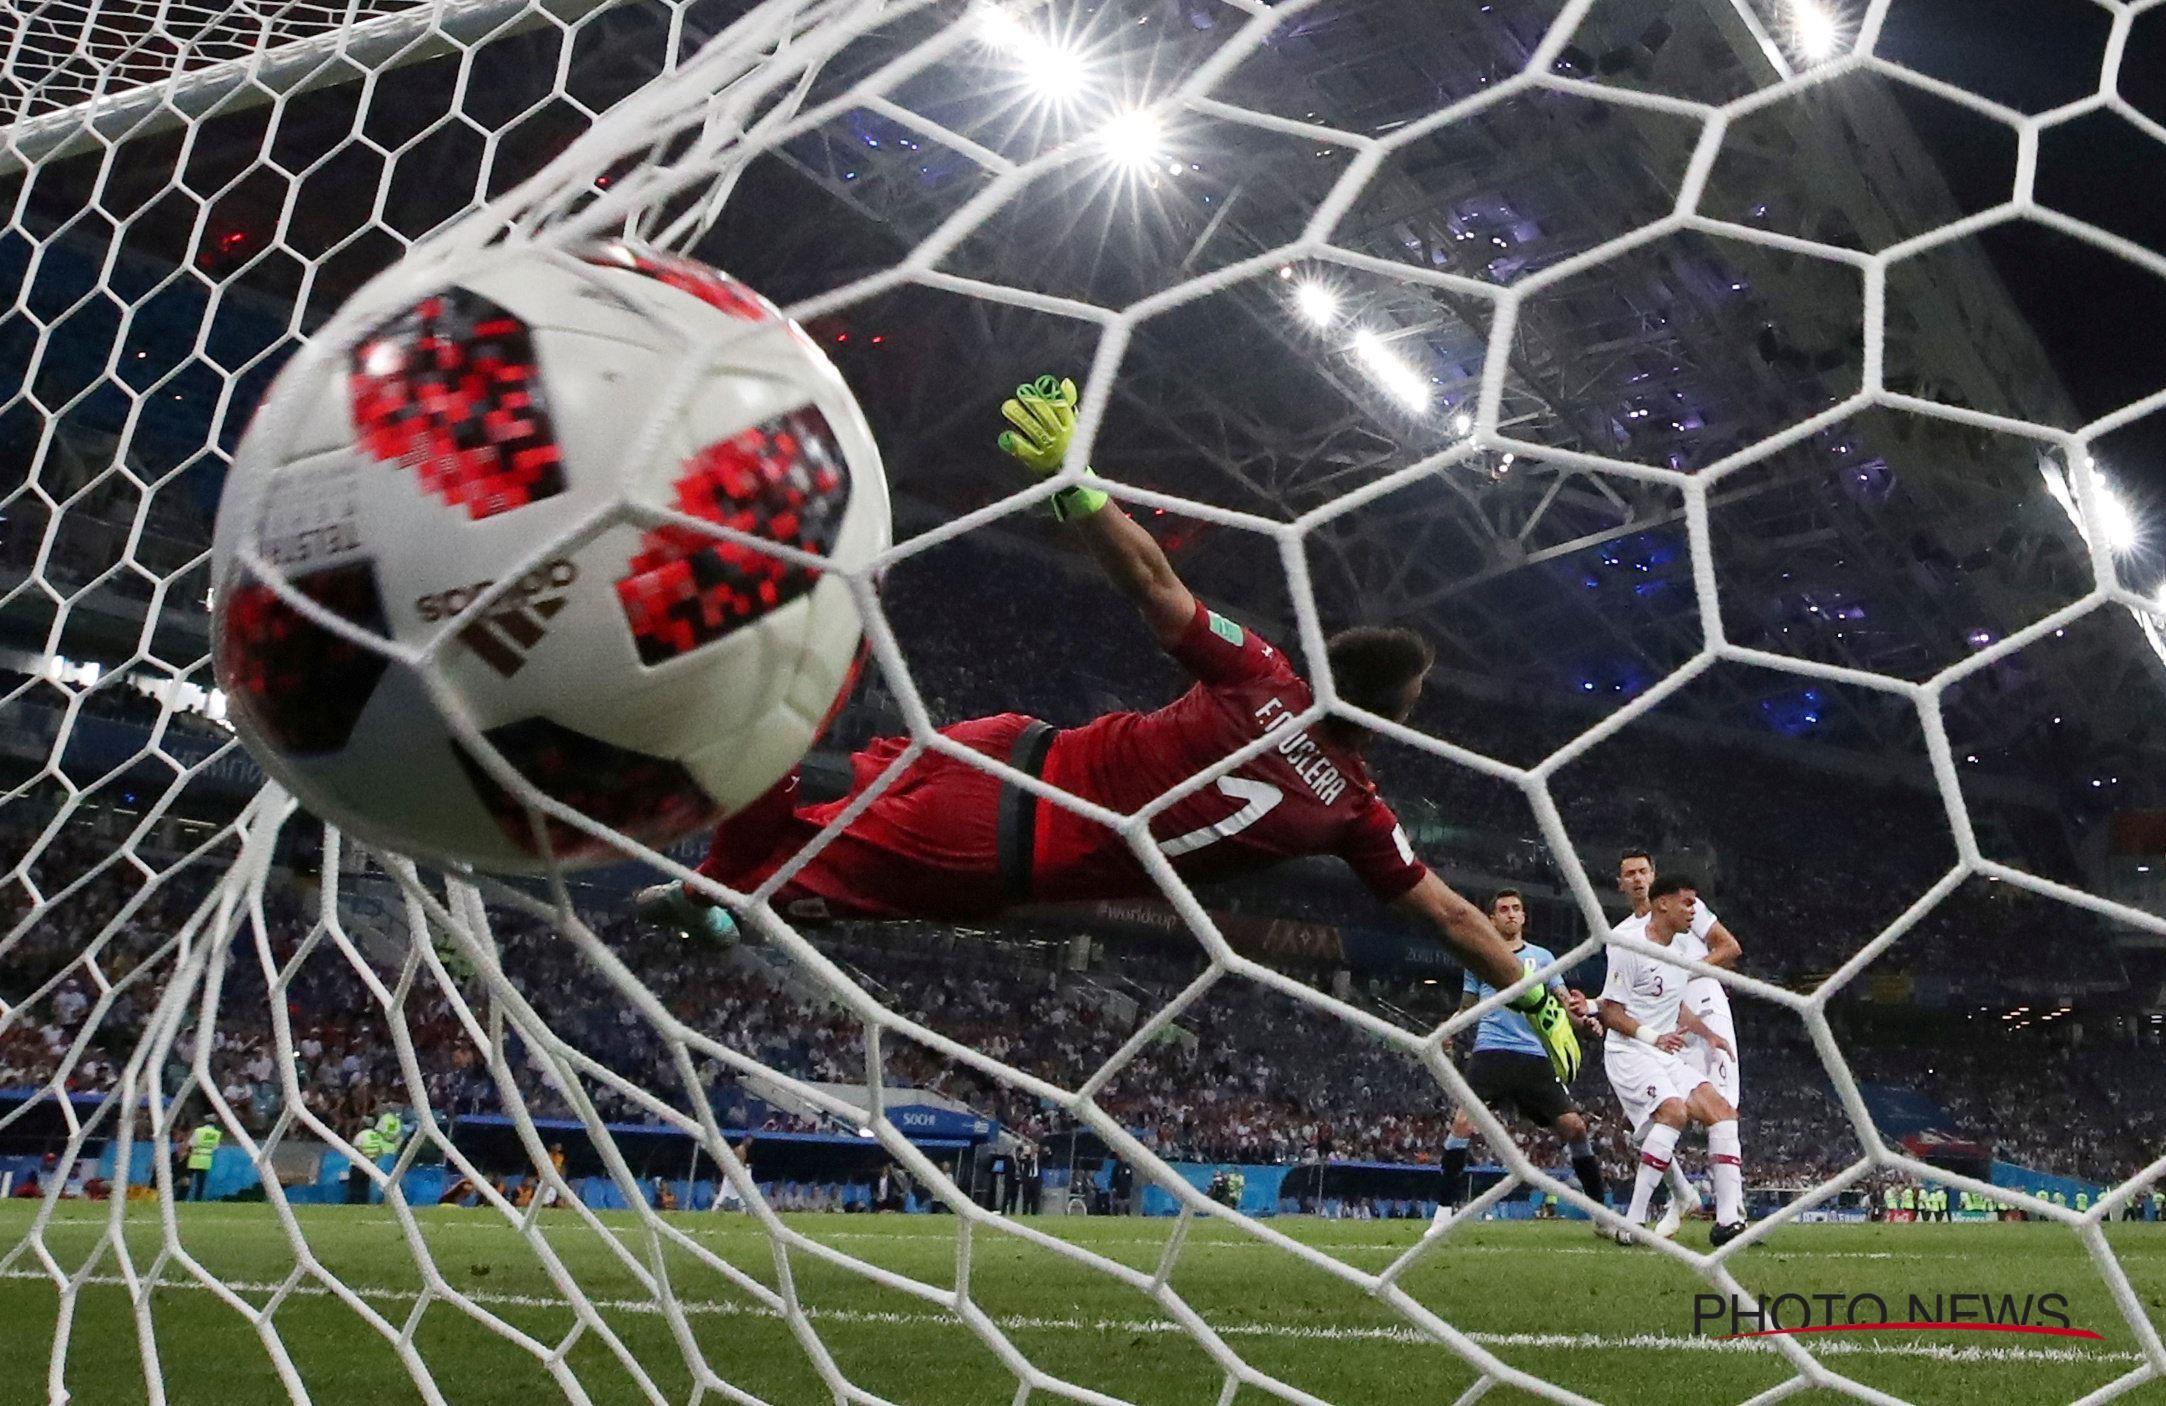 Gol de Uruguay - 2166x1406